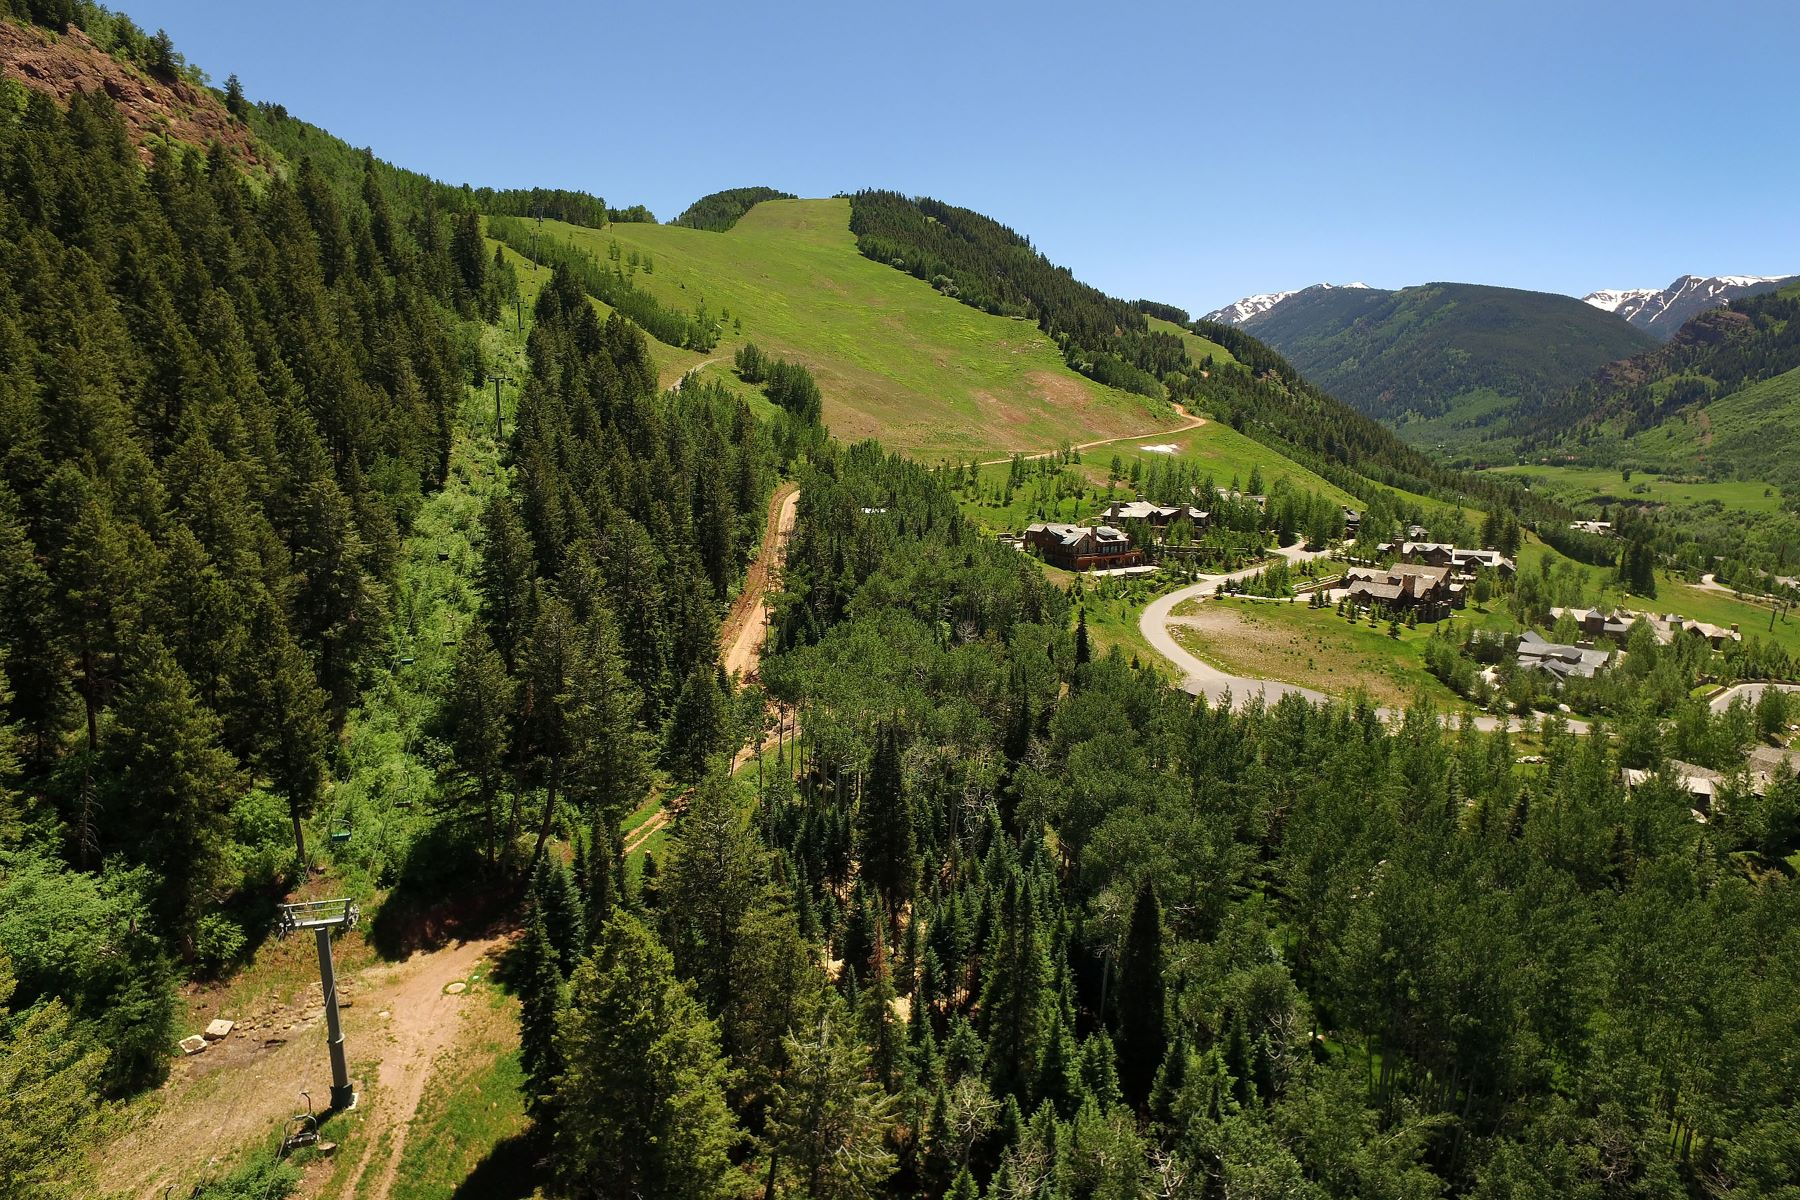 Terreno per Vendita alle ore Private Ski-In/Ski-Out Estate Property in Aspen Highlands TBD Thunderbowl Lane Aspen, Colorado, 81611 Stati Uniti